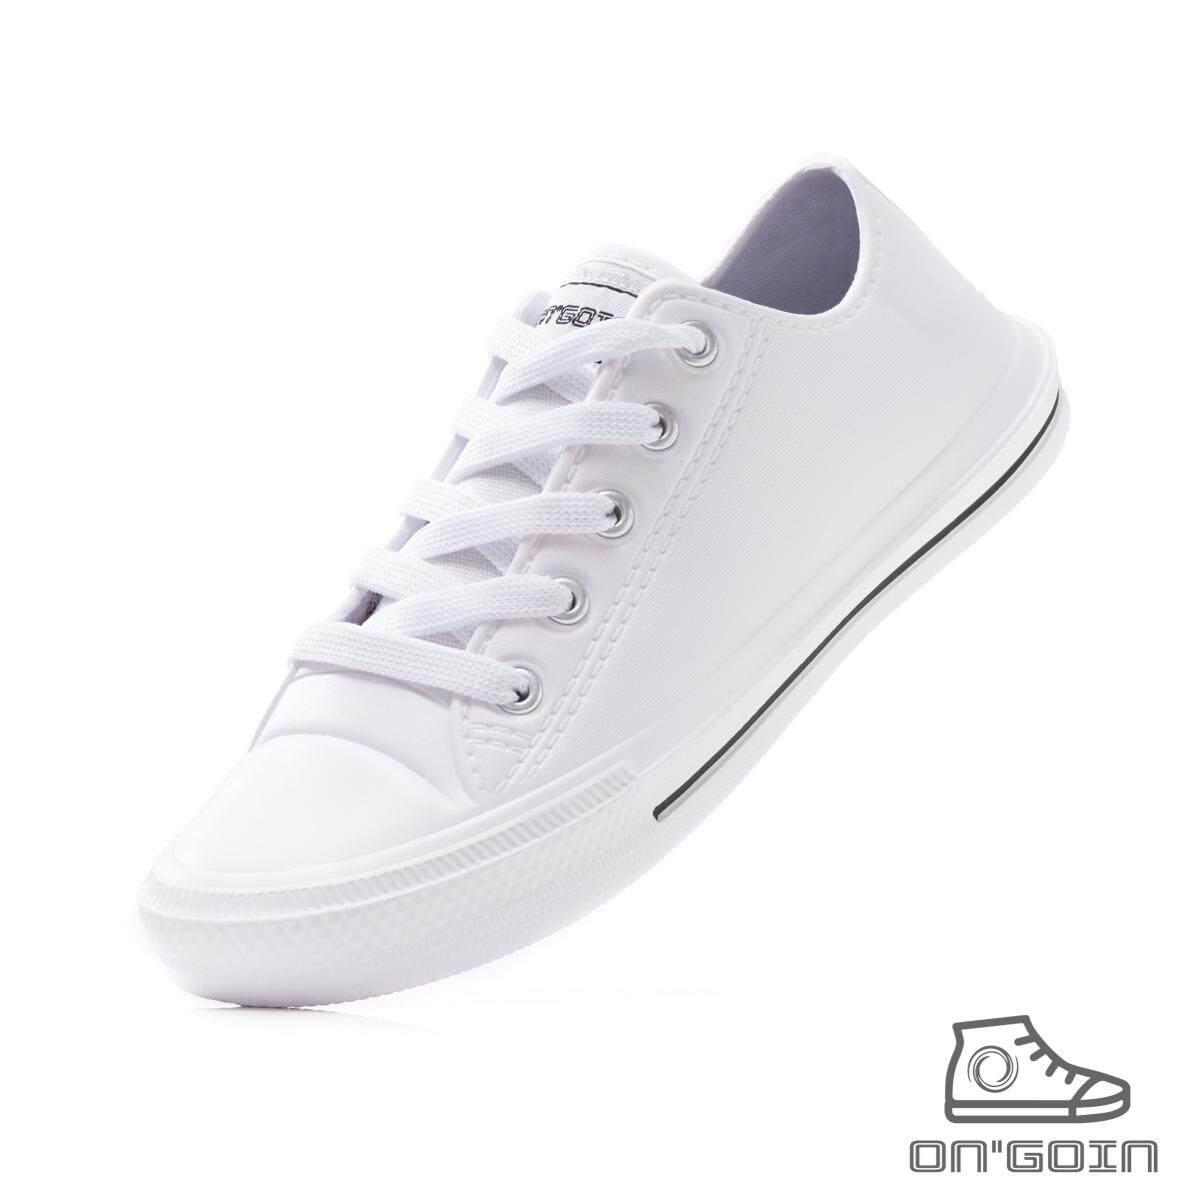 Buy Men Sneakers Malaysia Best Price Deals Lazada Sepatu Boot Wanita Rc316 Ongoin Jason Adult Eva Plimsolls Size Eu 36 45 Free Shipping Local